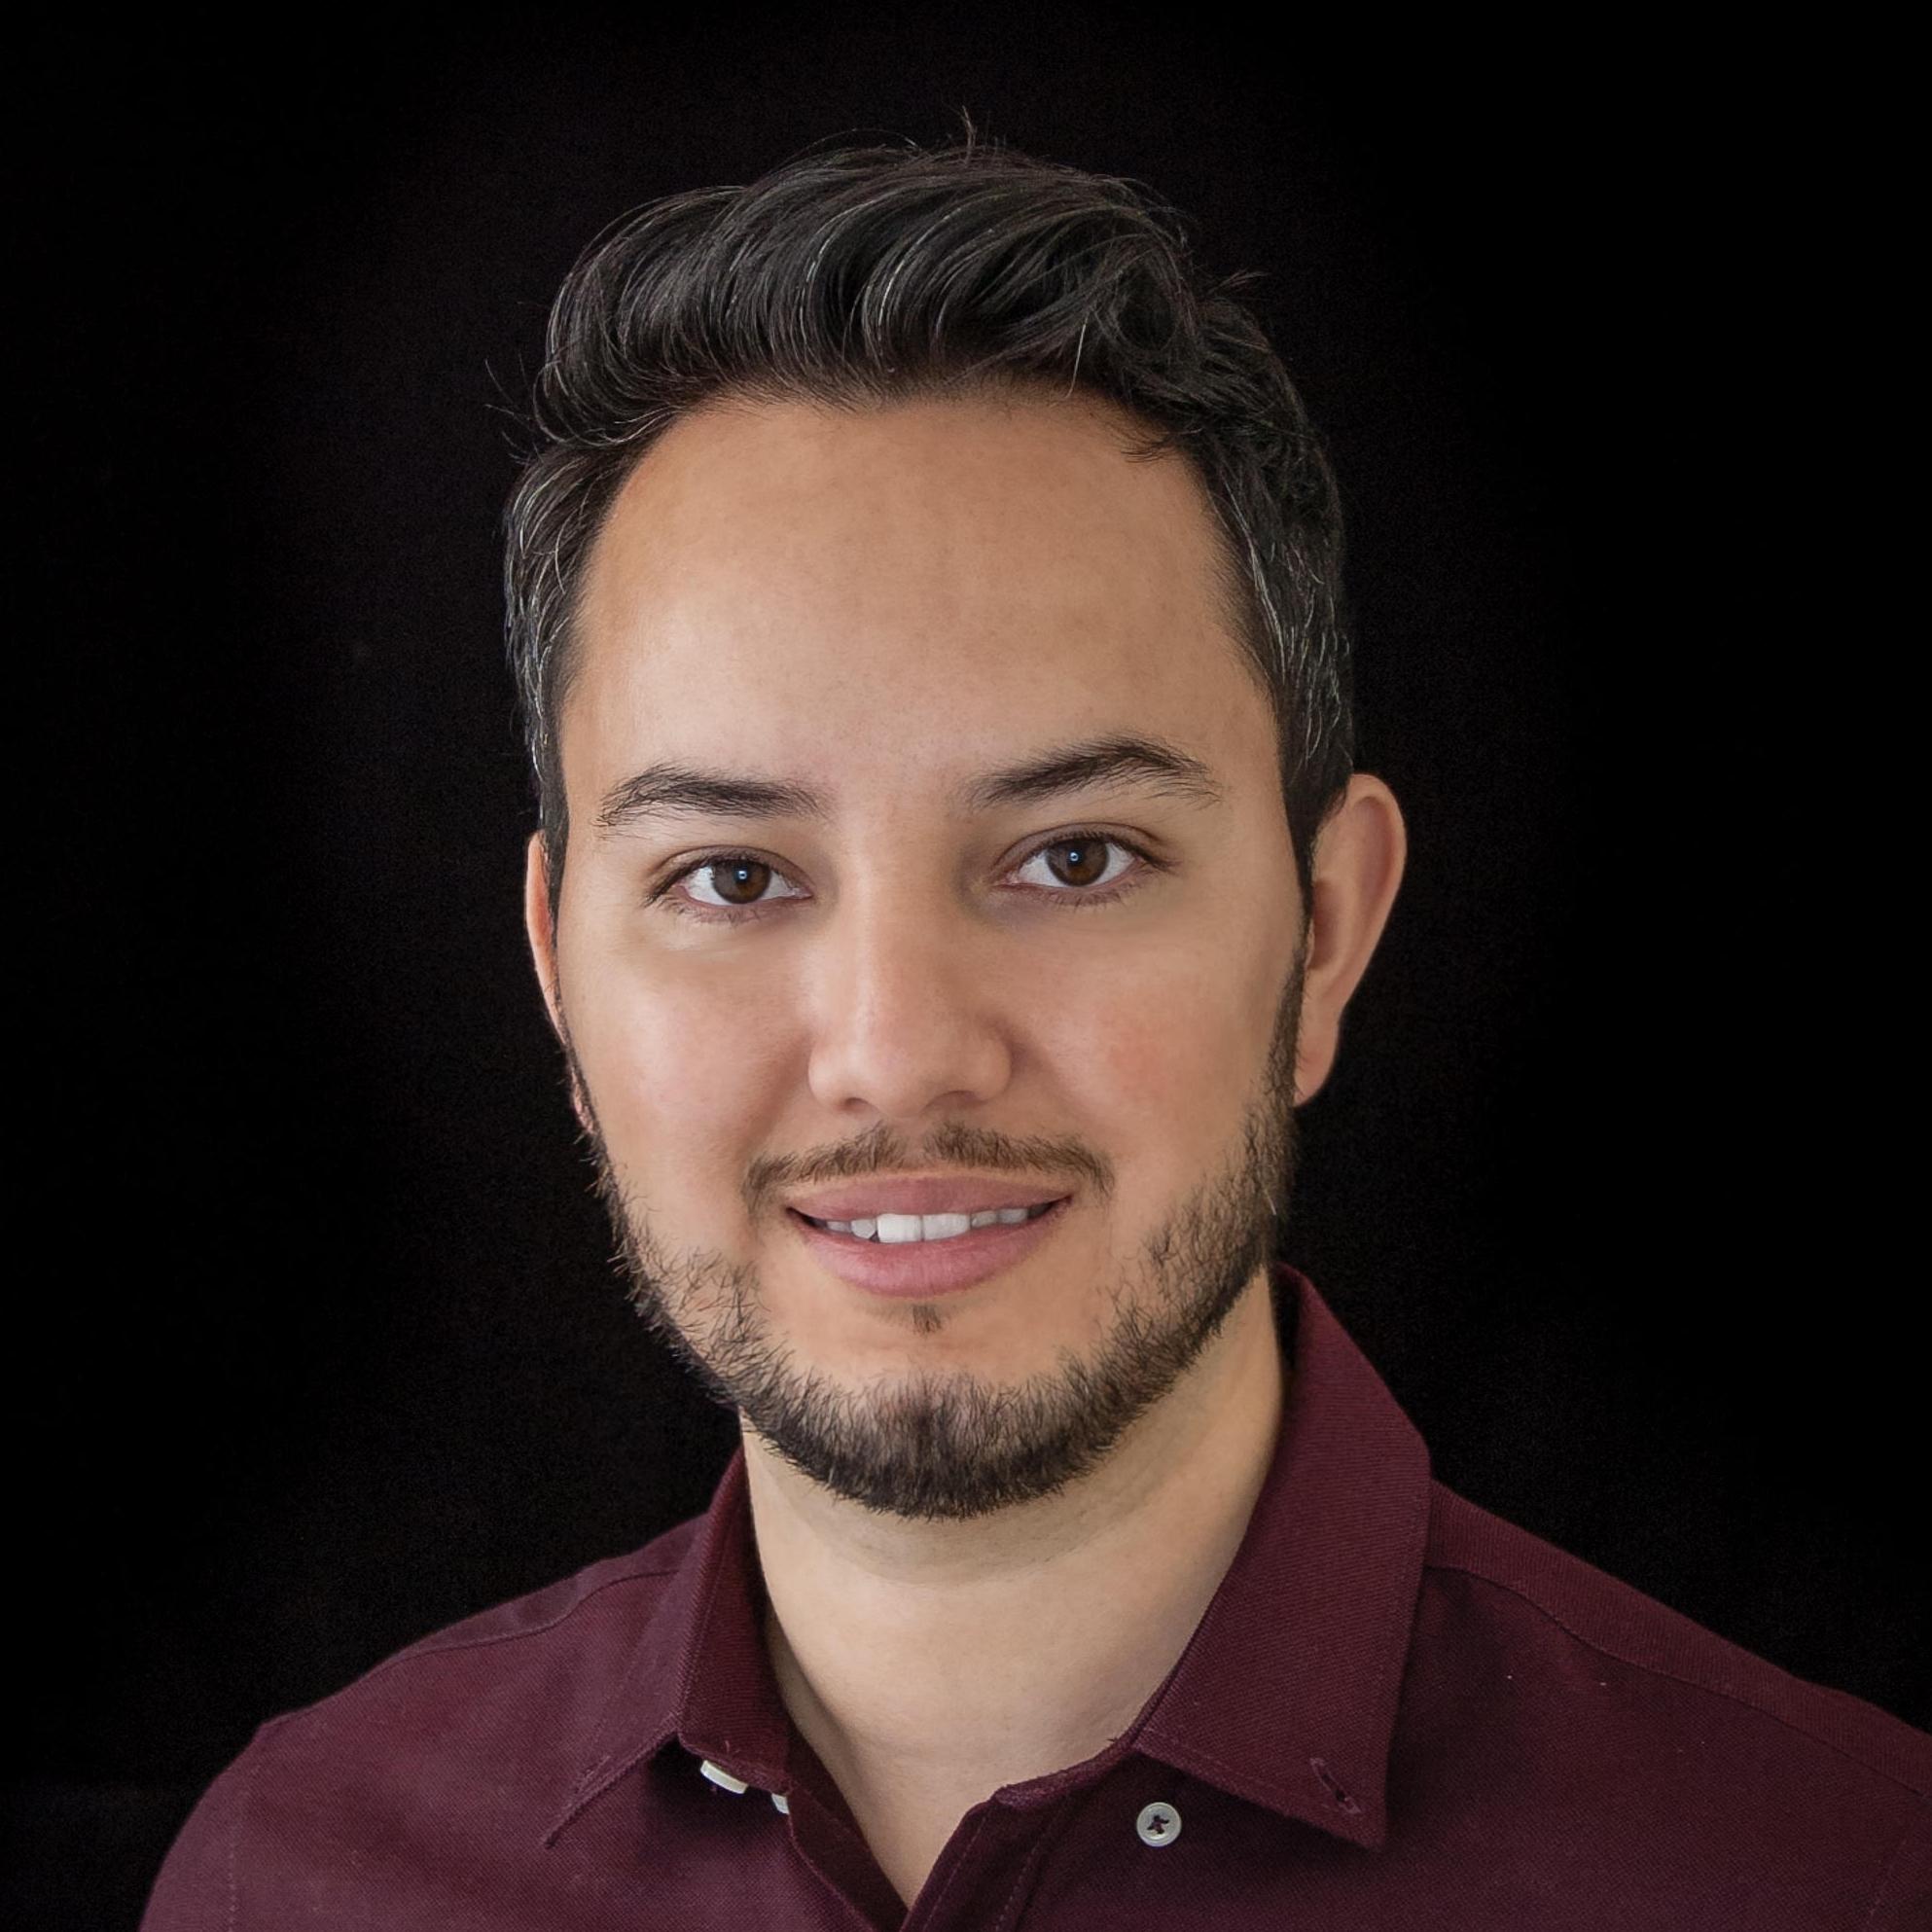 Fernando DeLeon, co-founder of Innovare Social Innovation Partners